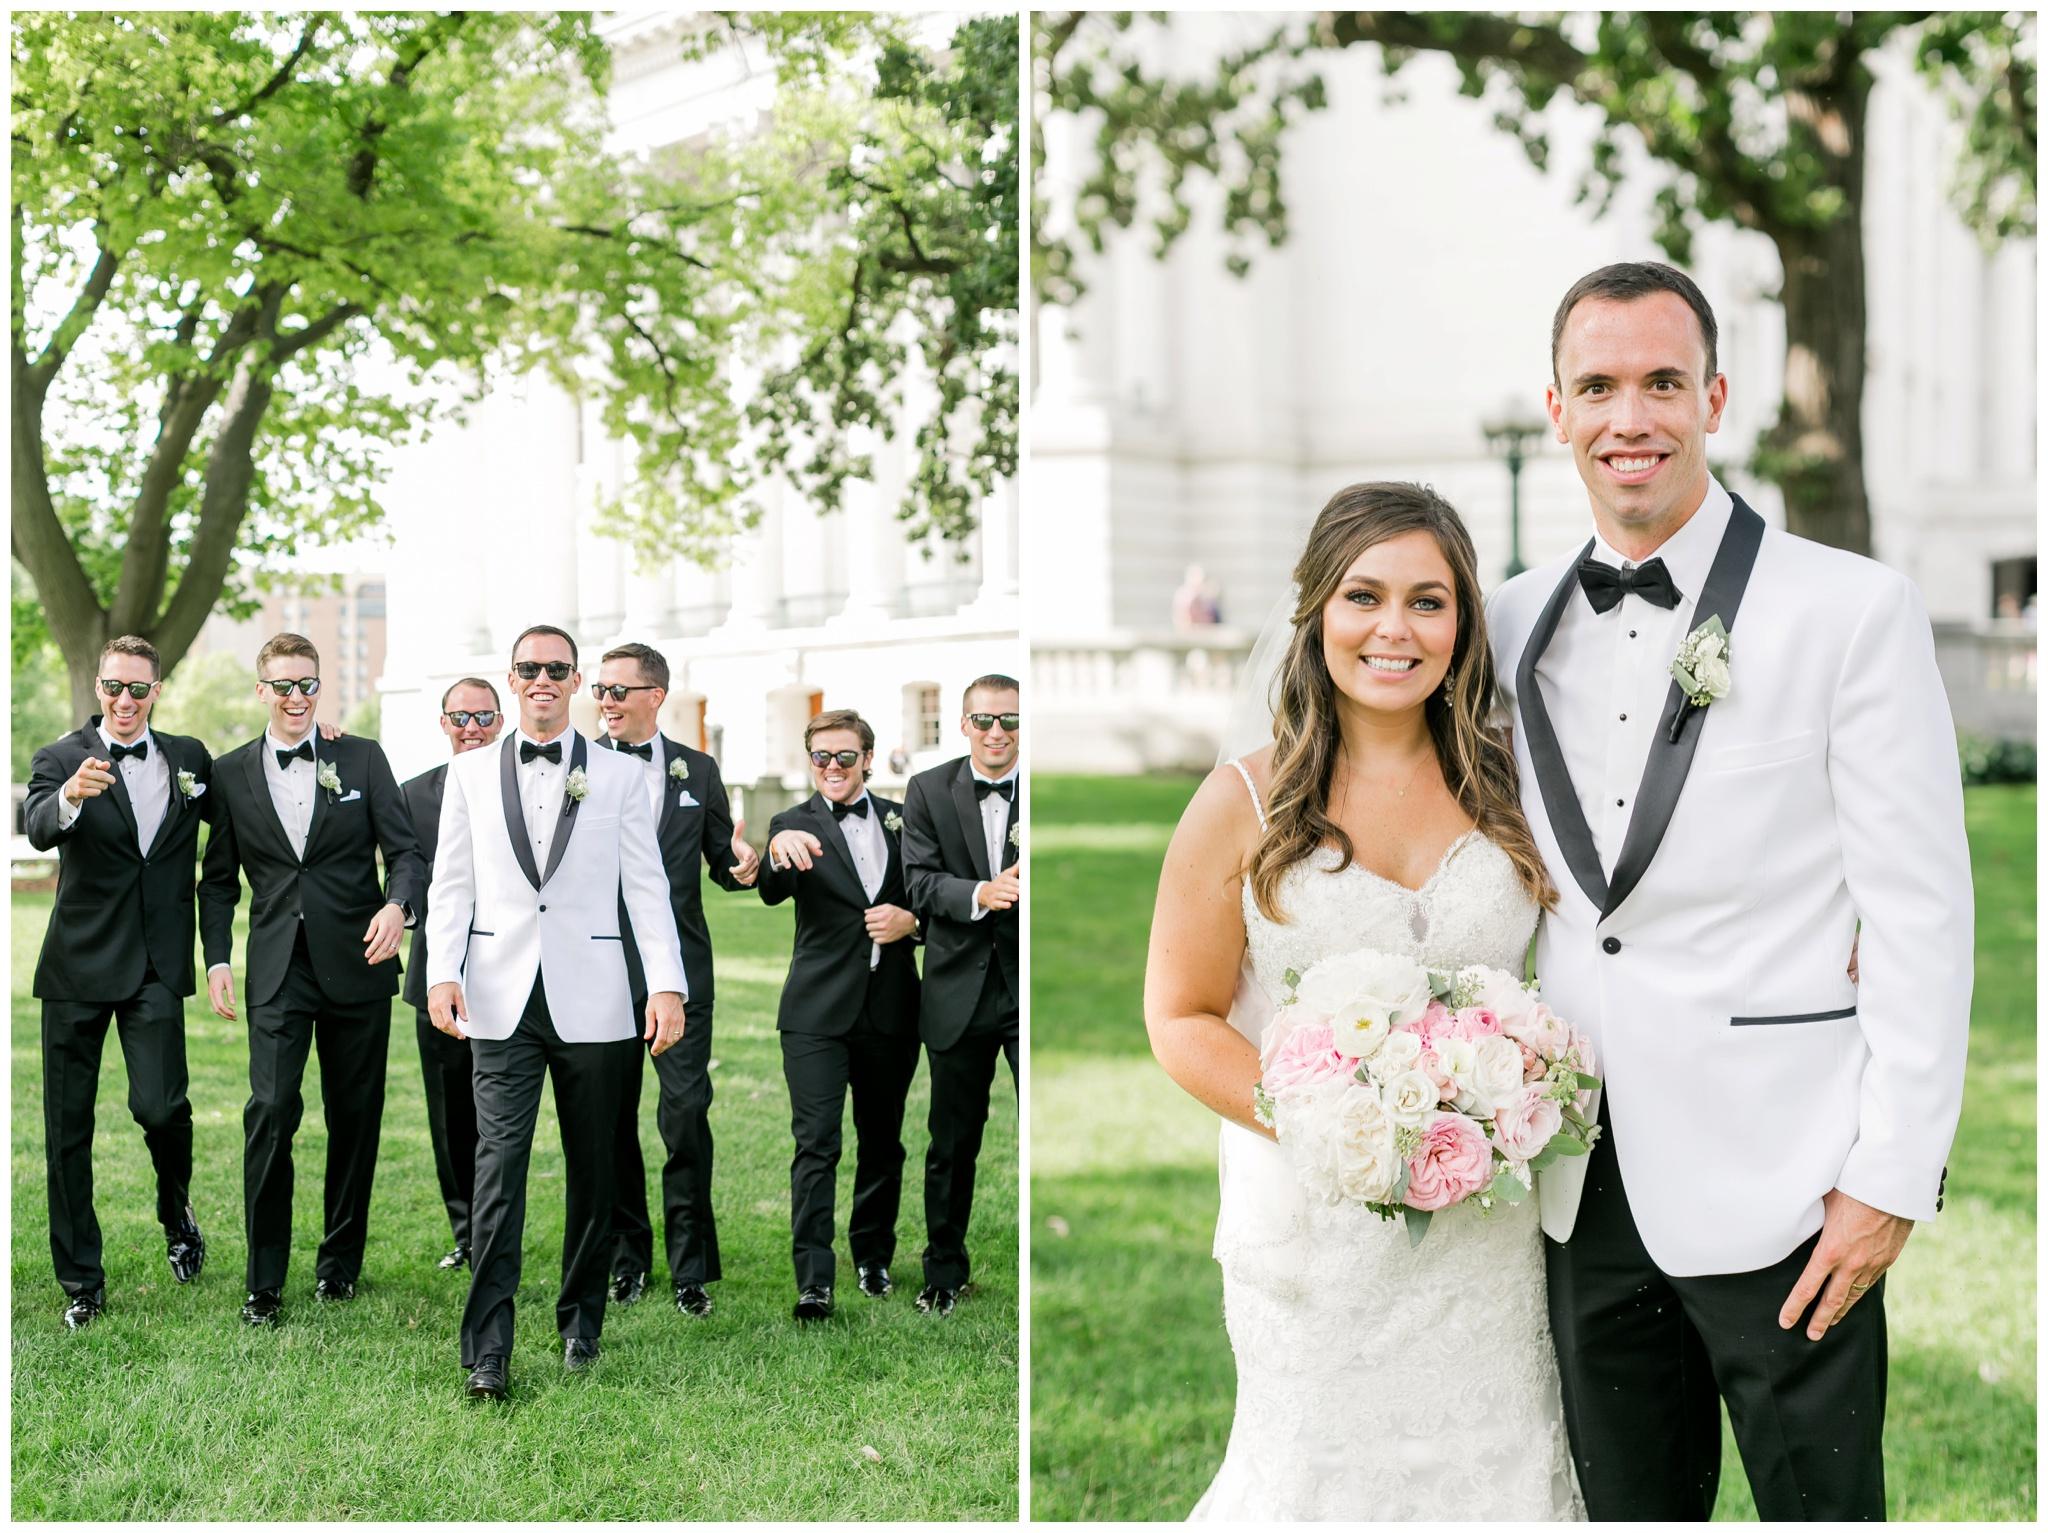 UW_Memorial_Union_wedding_madison_wisconsin_wedding_photographers_4622.jpg